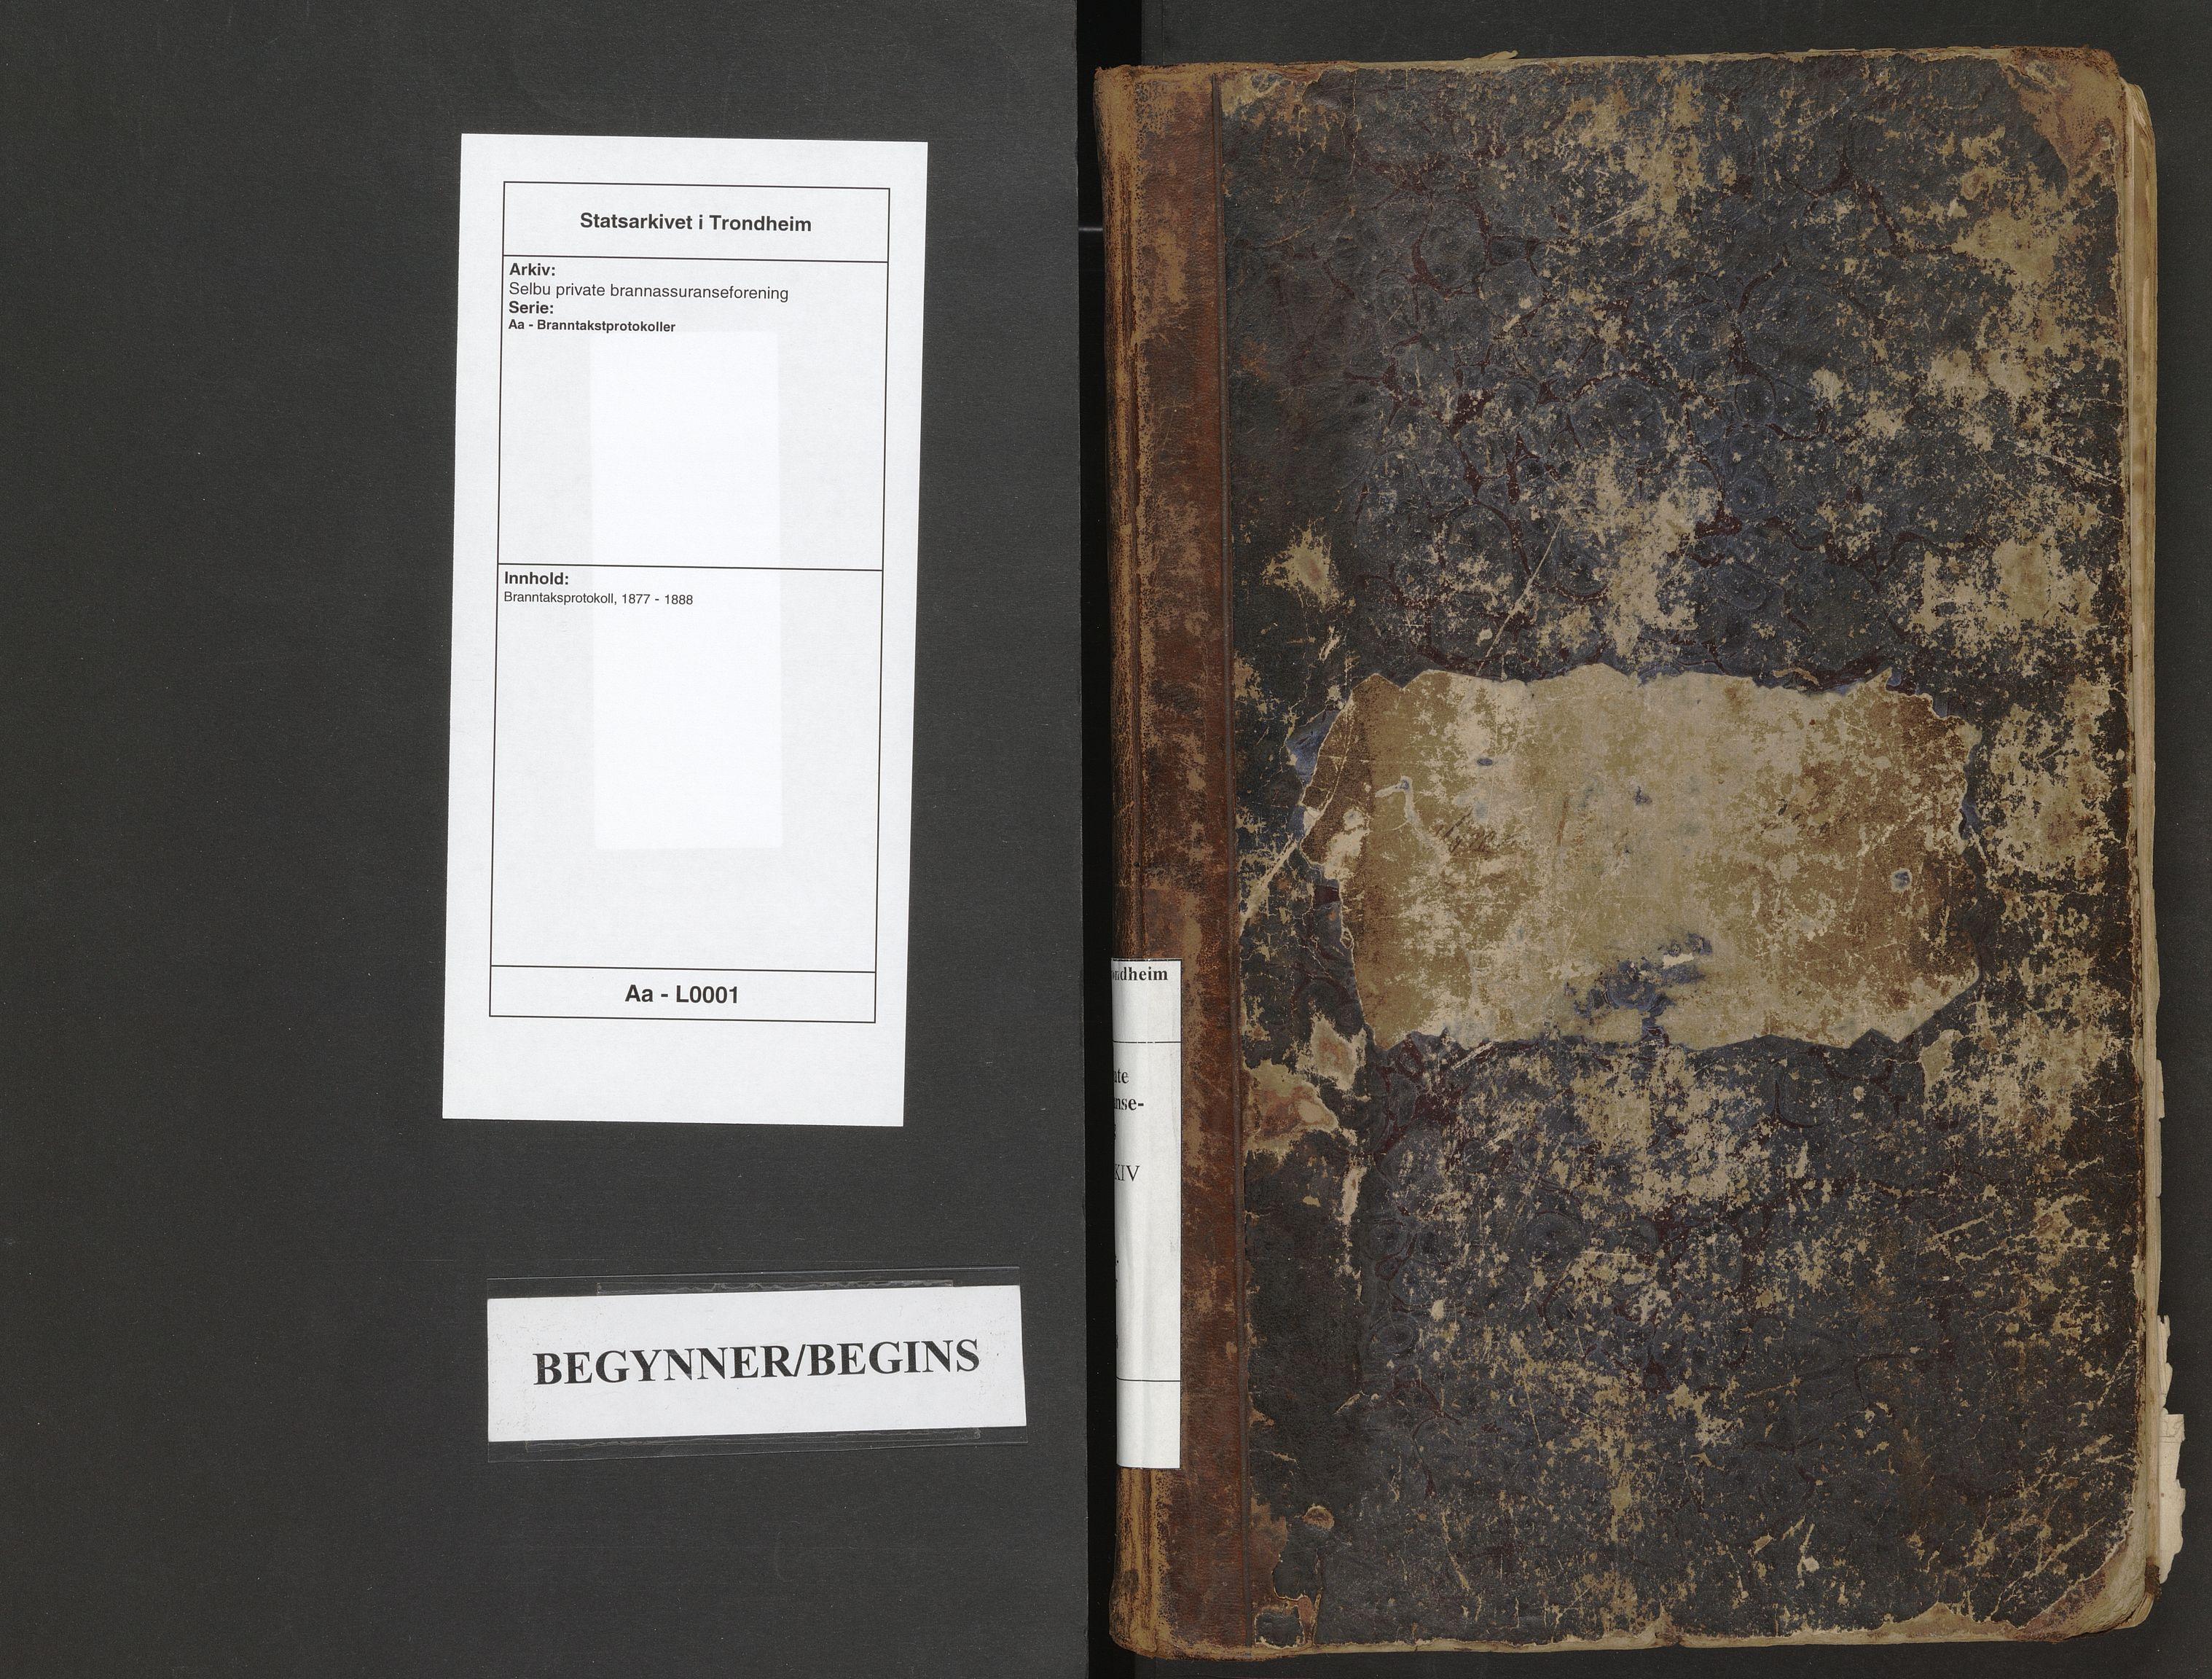 SAT, Selbu private brannassuranseforening, Aa/L0001: Branntaksprotokoll, 1877-1888